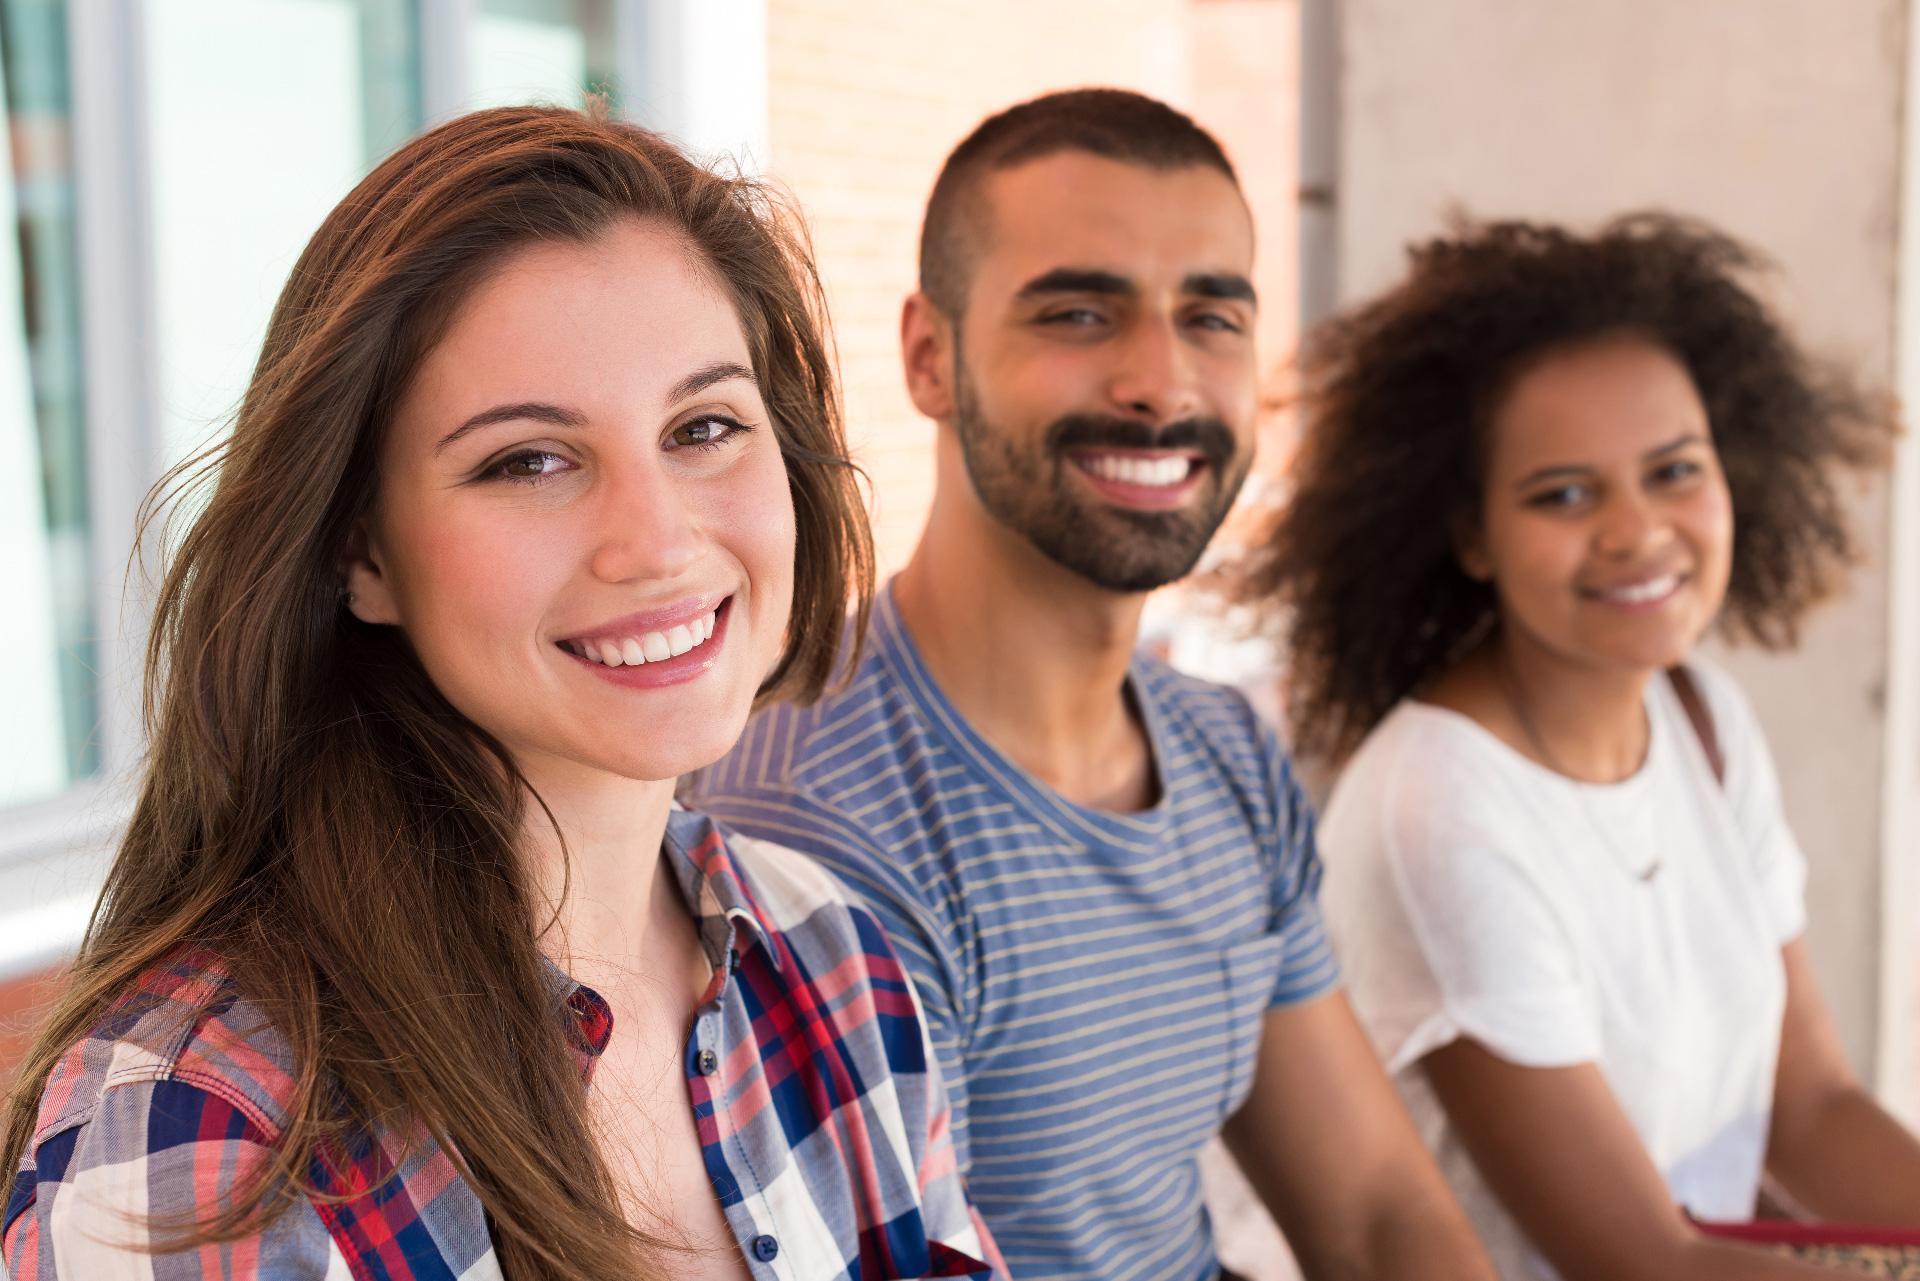 Studenti Top-up programu v Dánsku